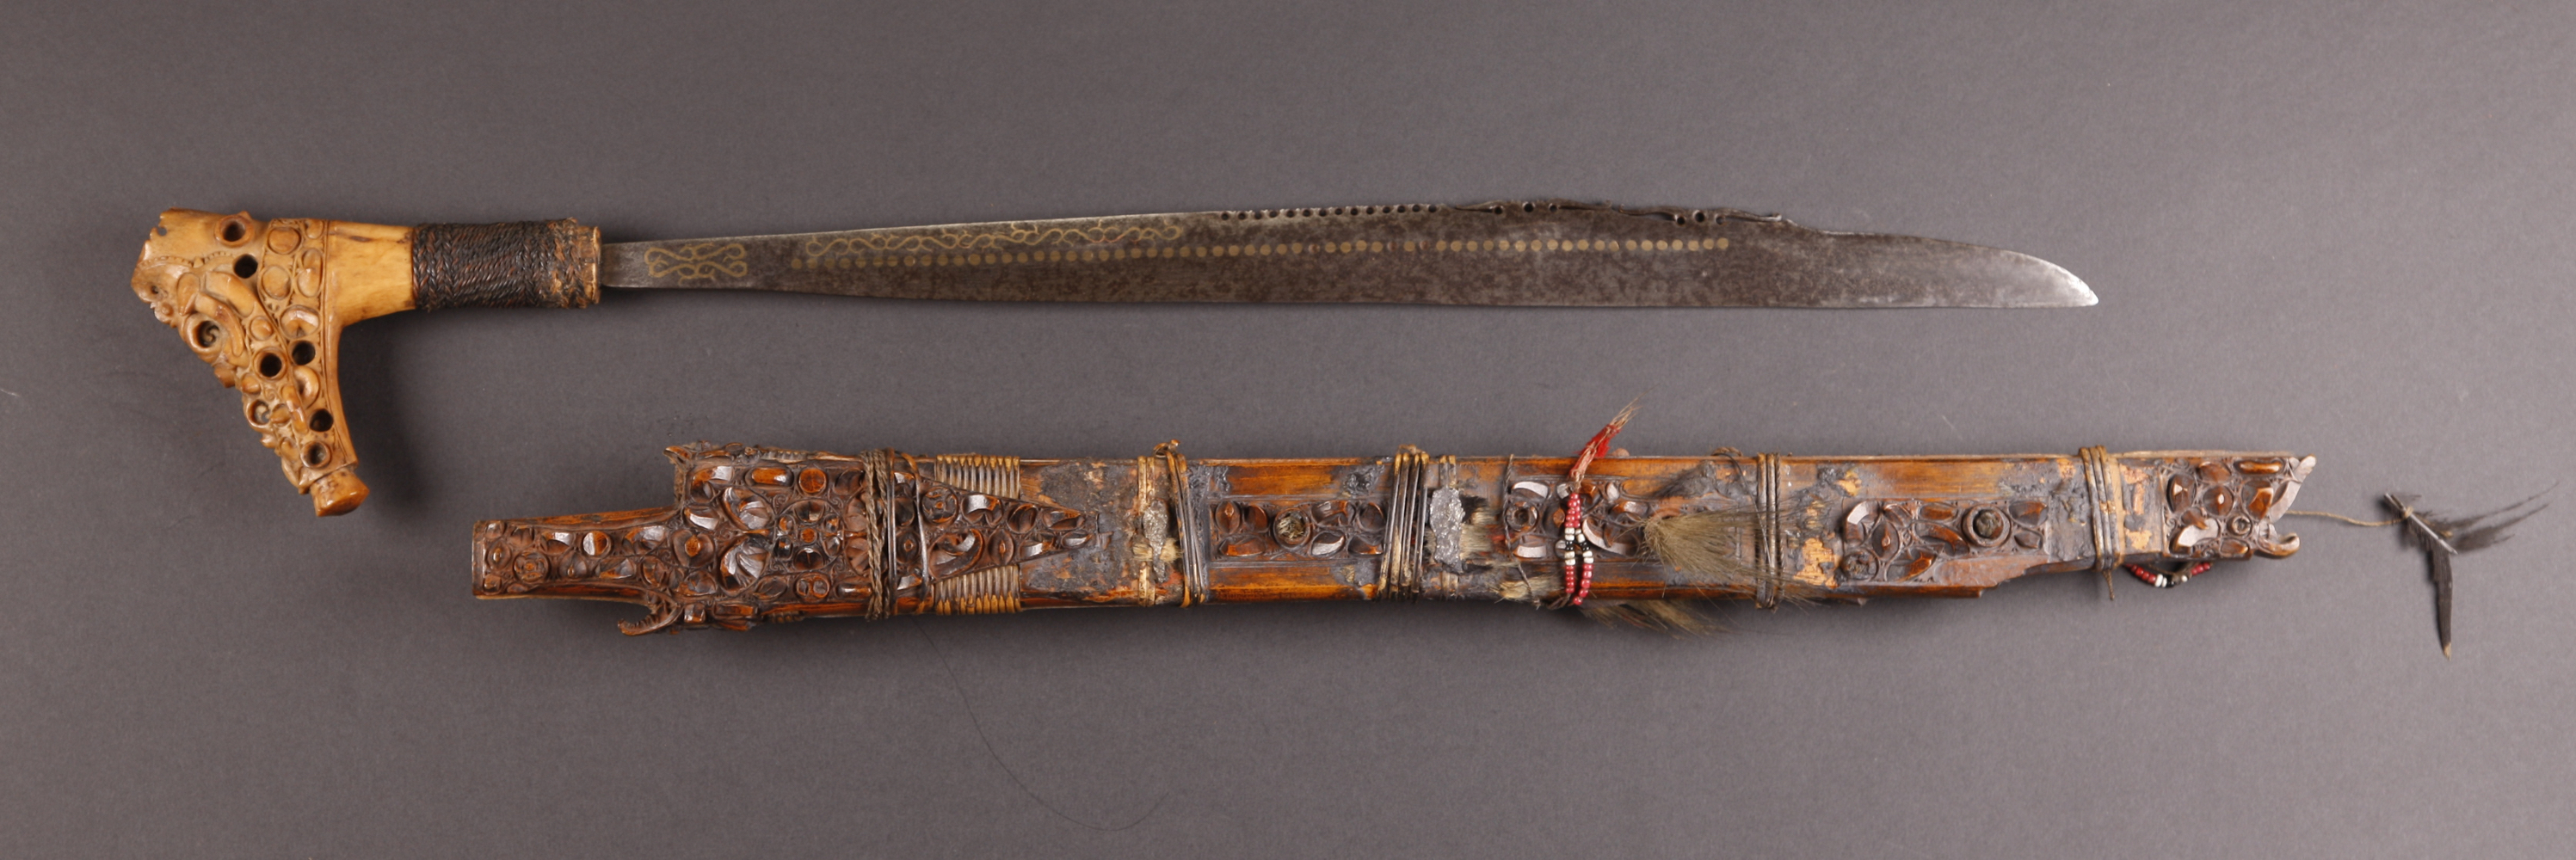 INDO618 : Dayak Mandau Sword